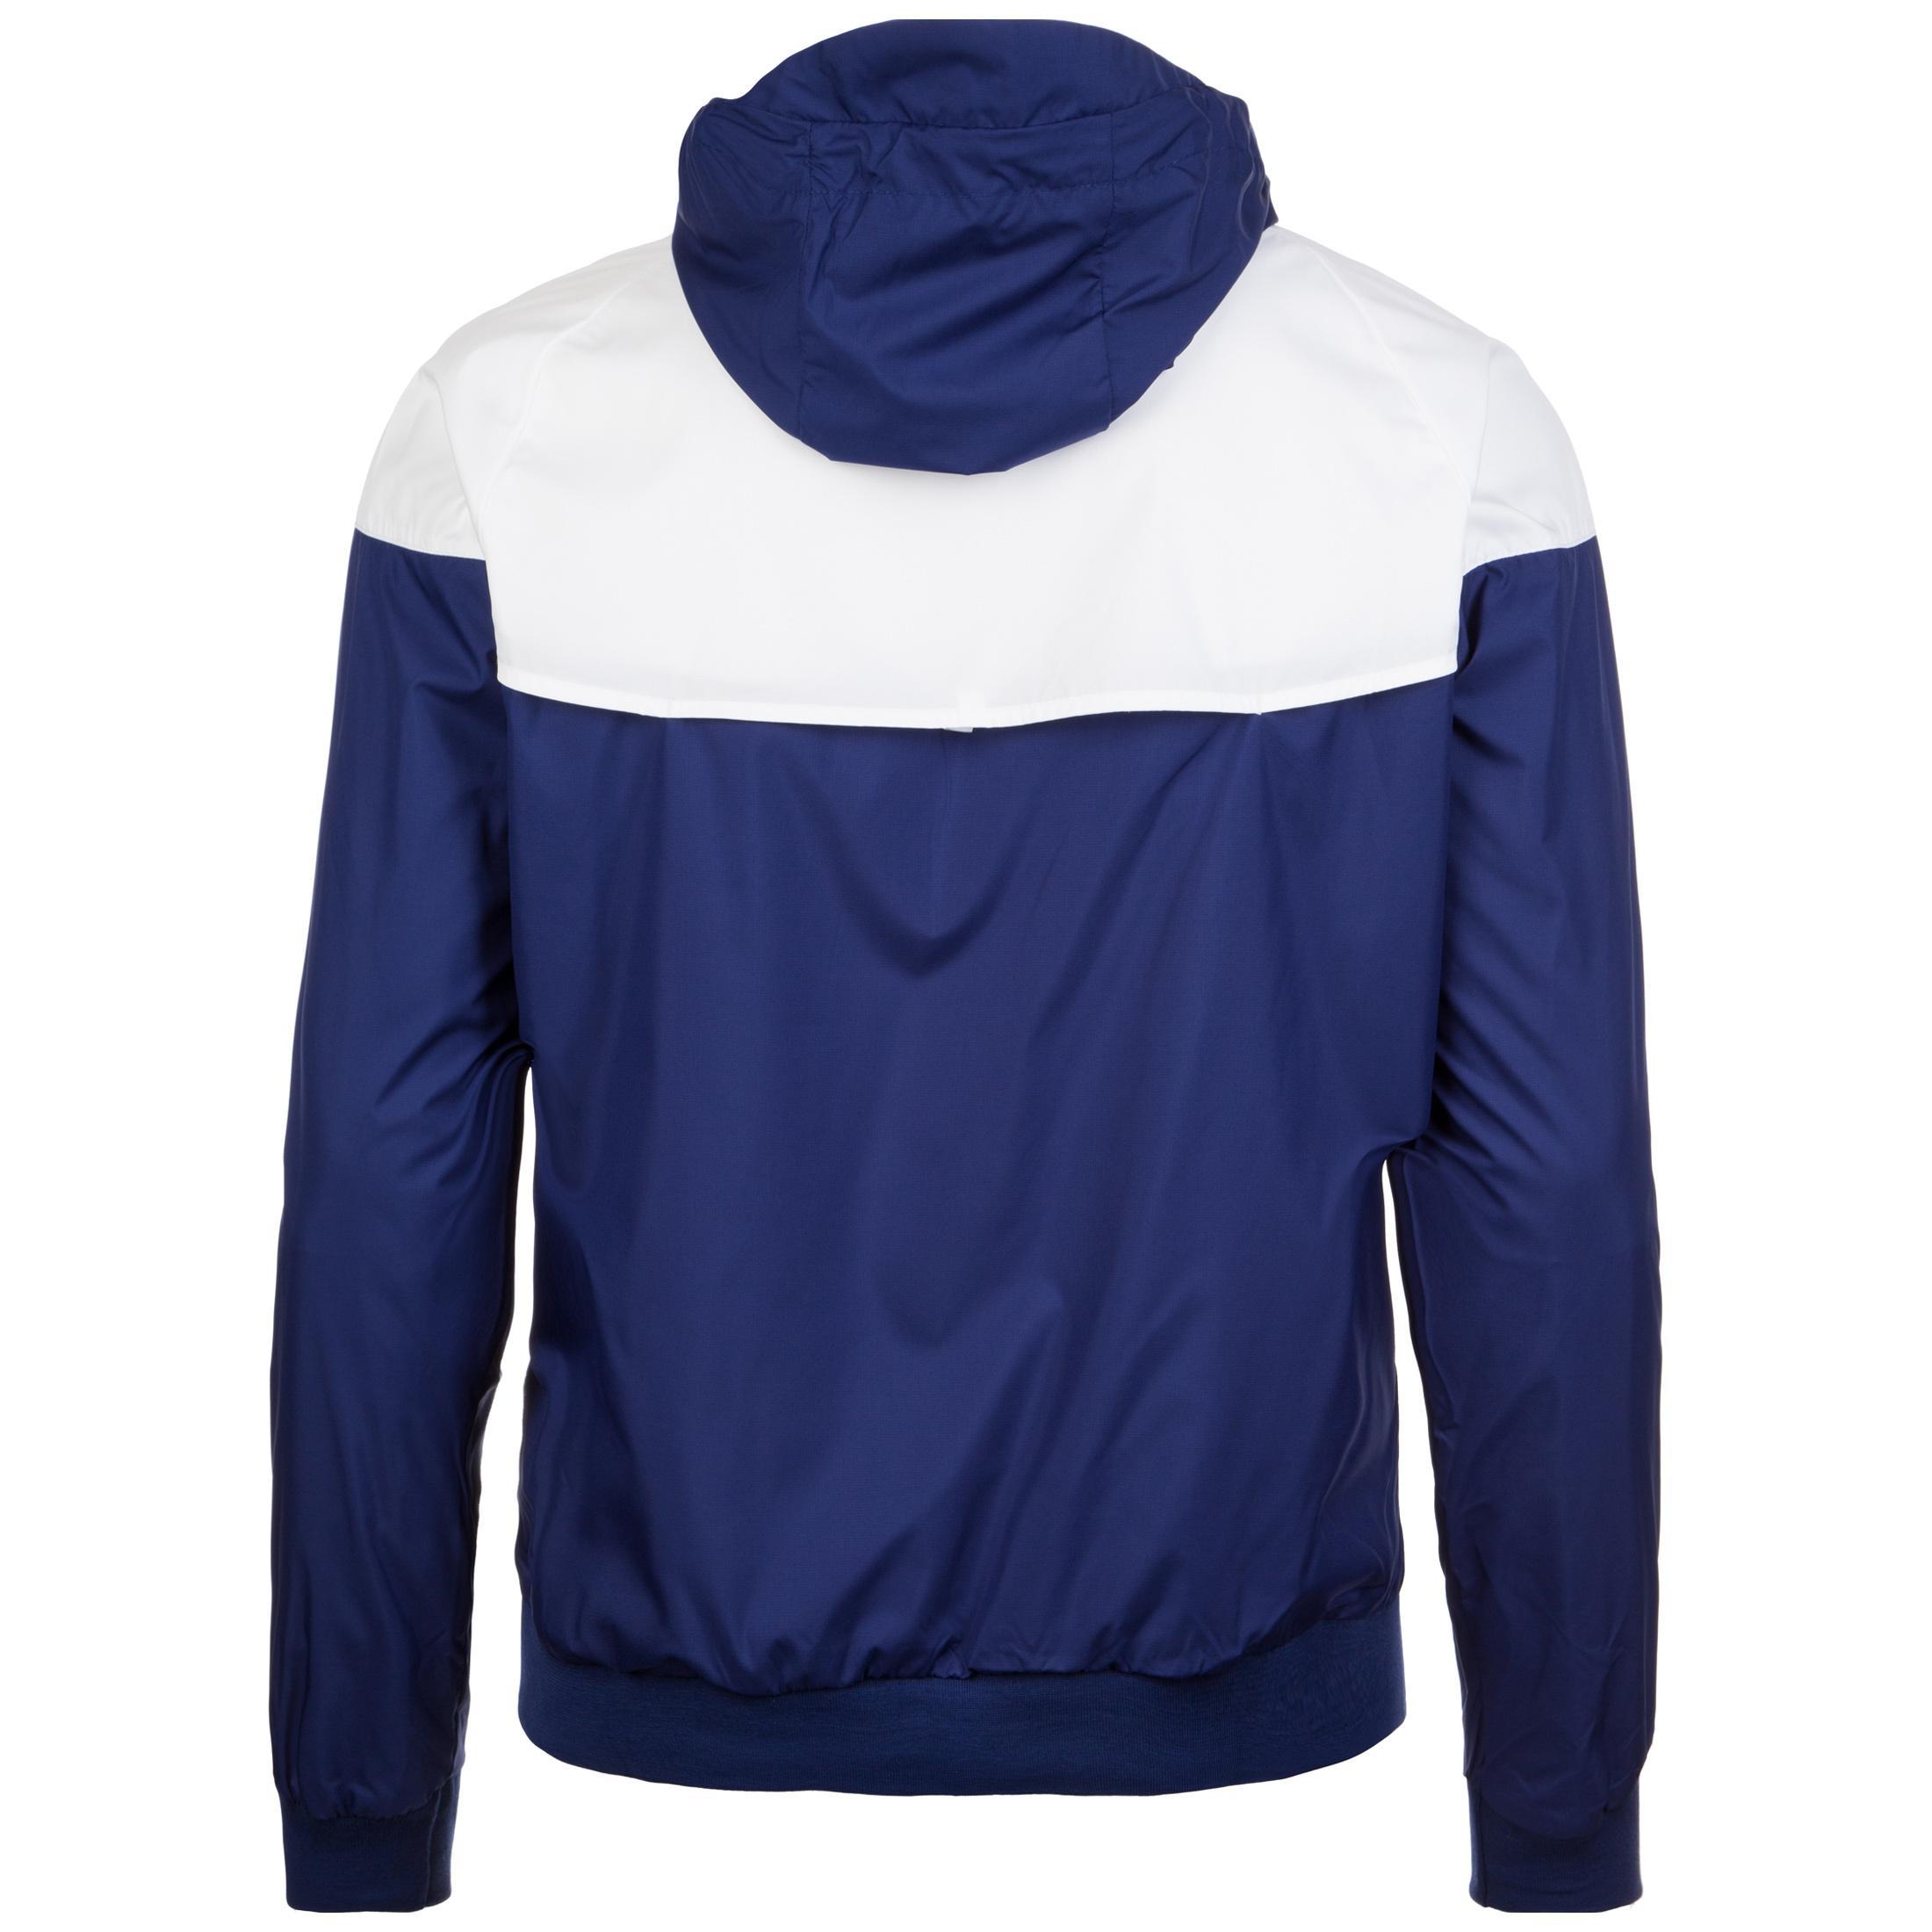 heißer verkauf Nike NSW WR WVN AUT Jacke, PSGParis Saint